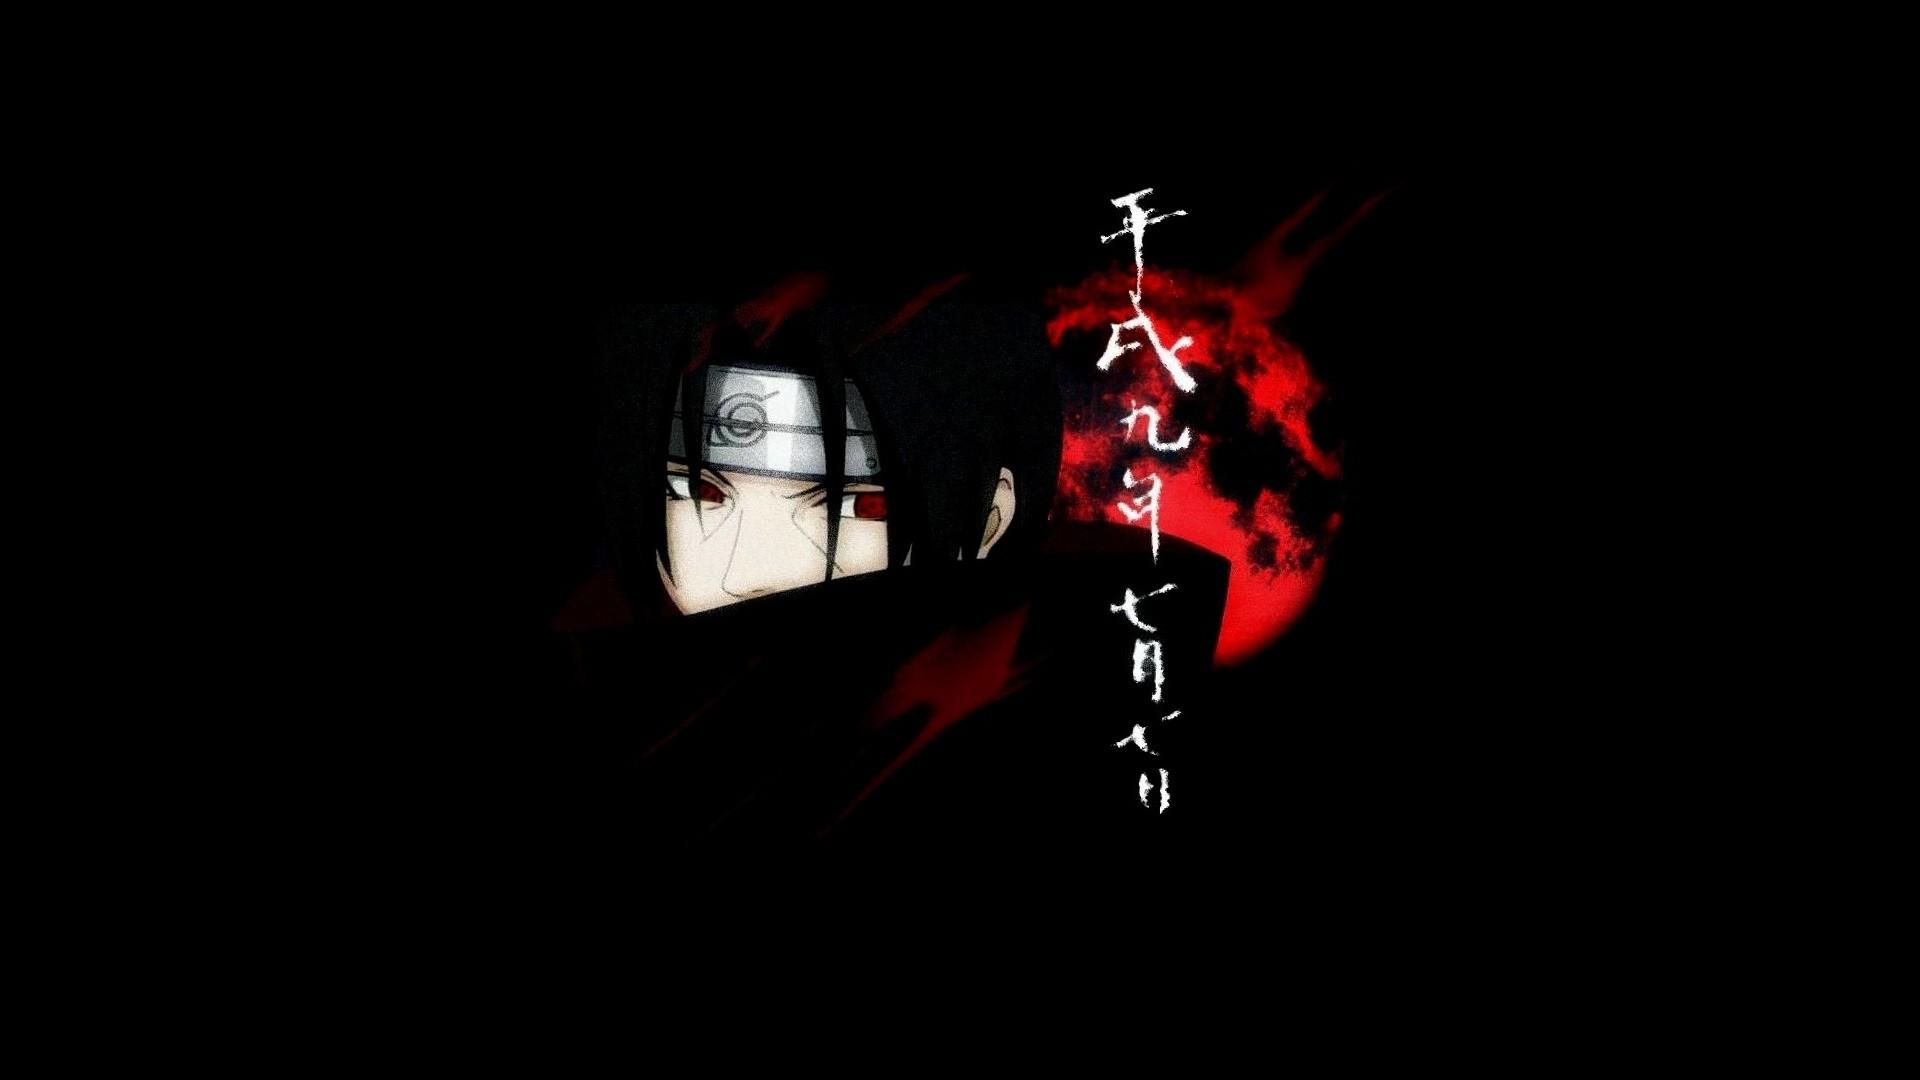 Anime – Naruto Itachi Uchiha Evil Ninja Wallpaper